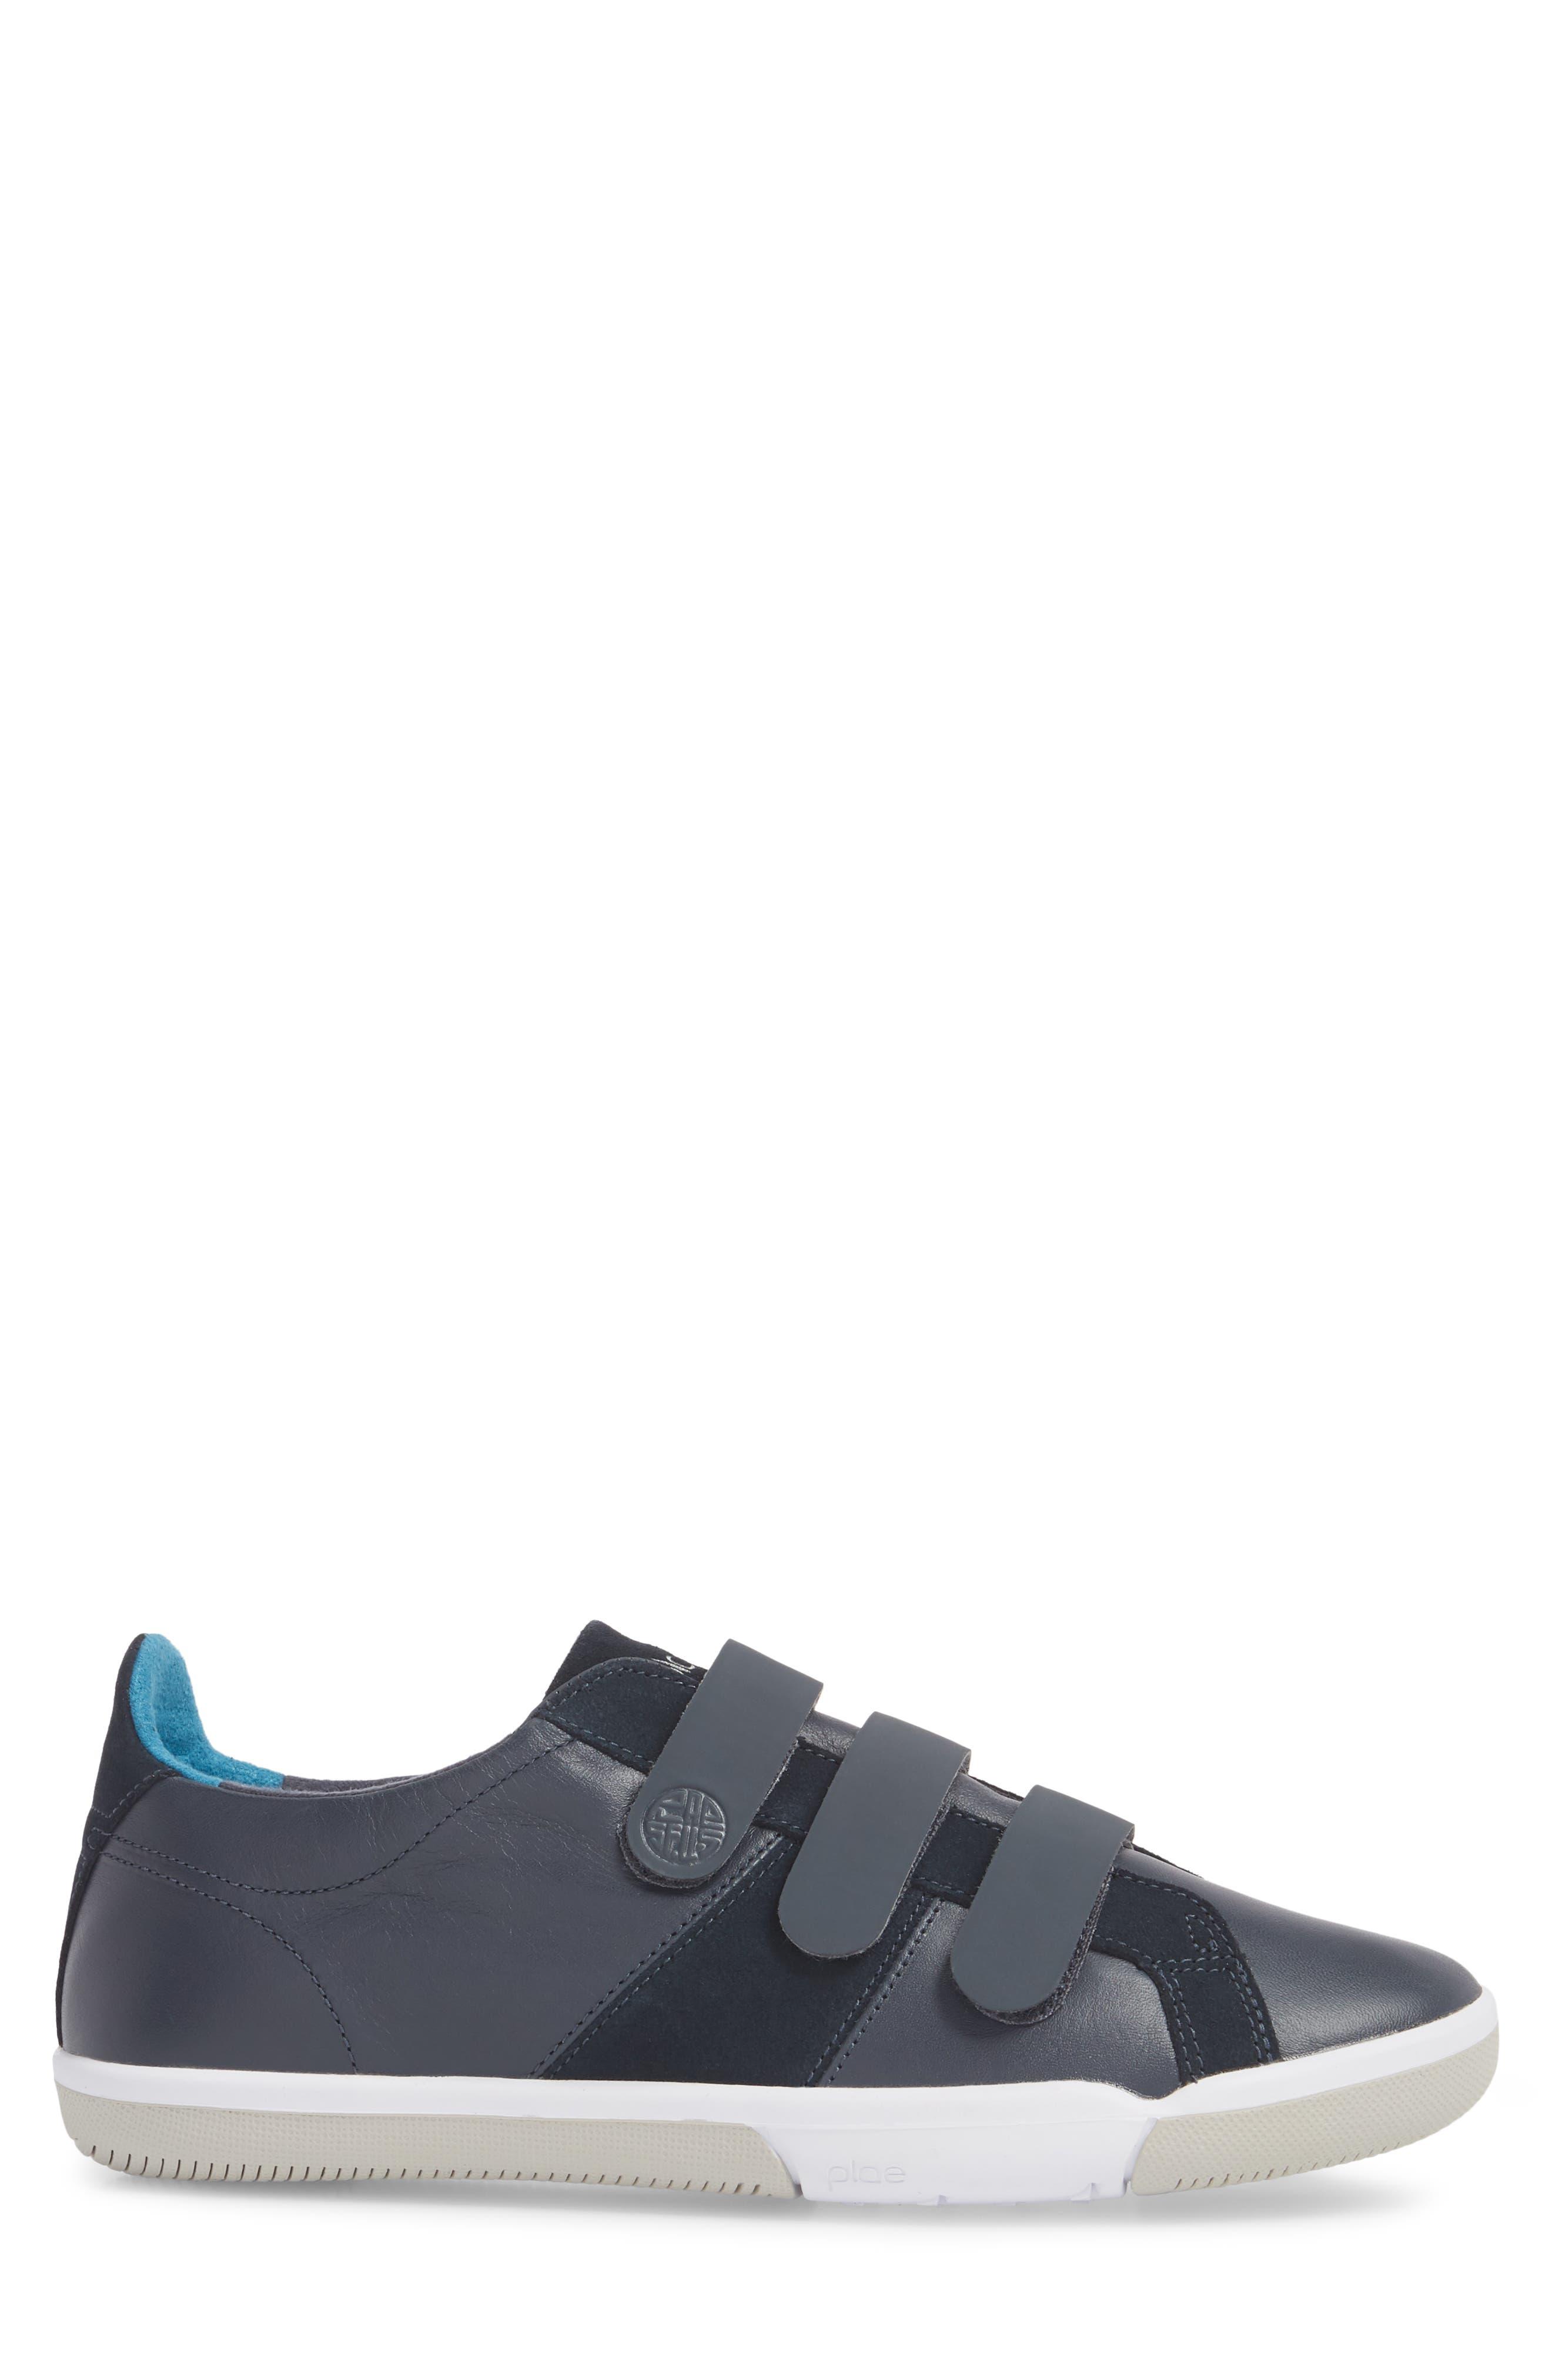 Larkin Low Top Sneaker,                             Alternate thumbnail 3, color,                             Blue Nights